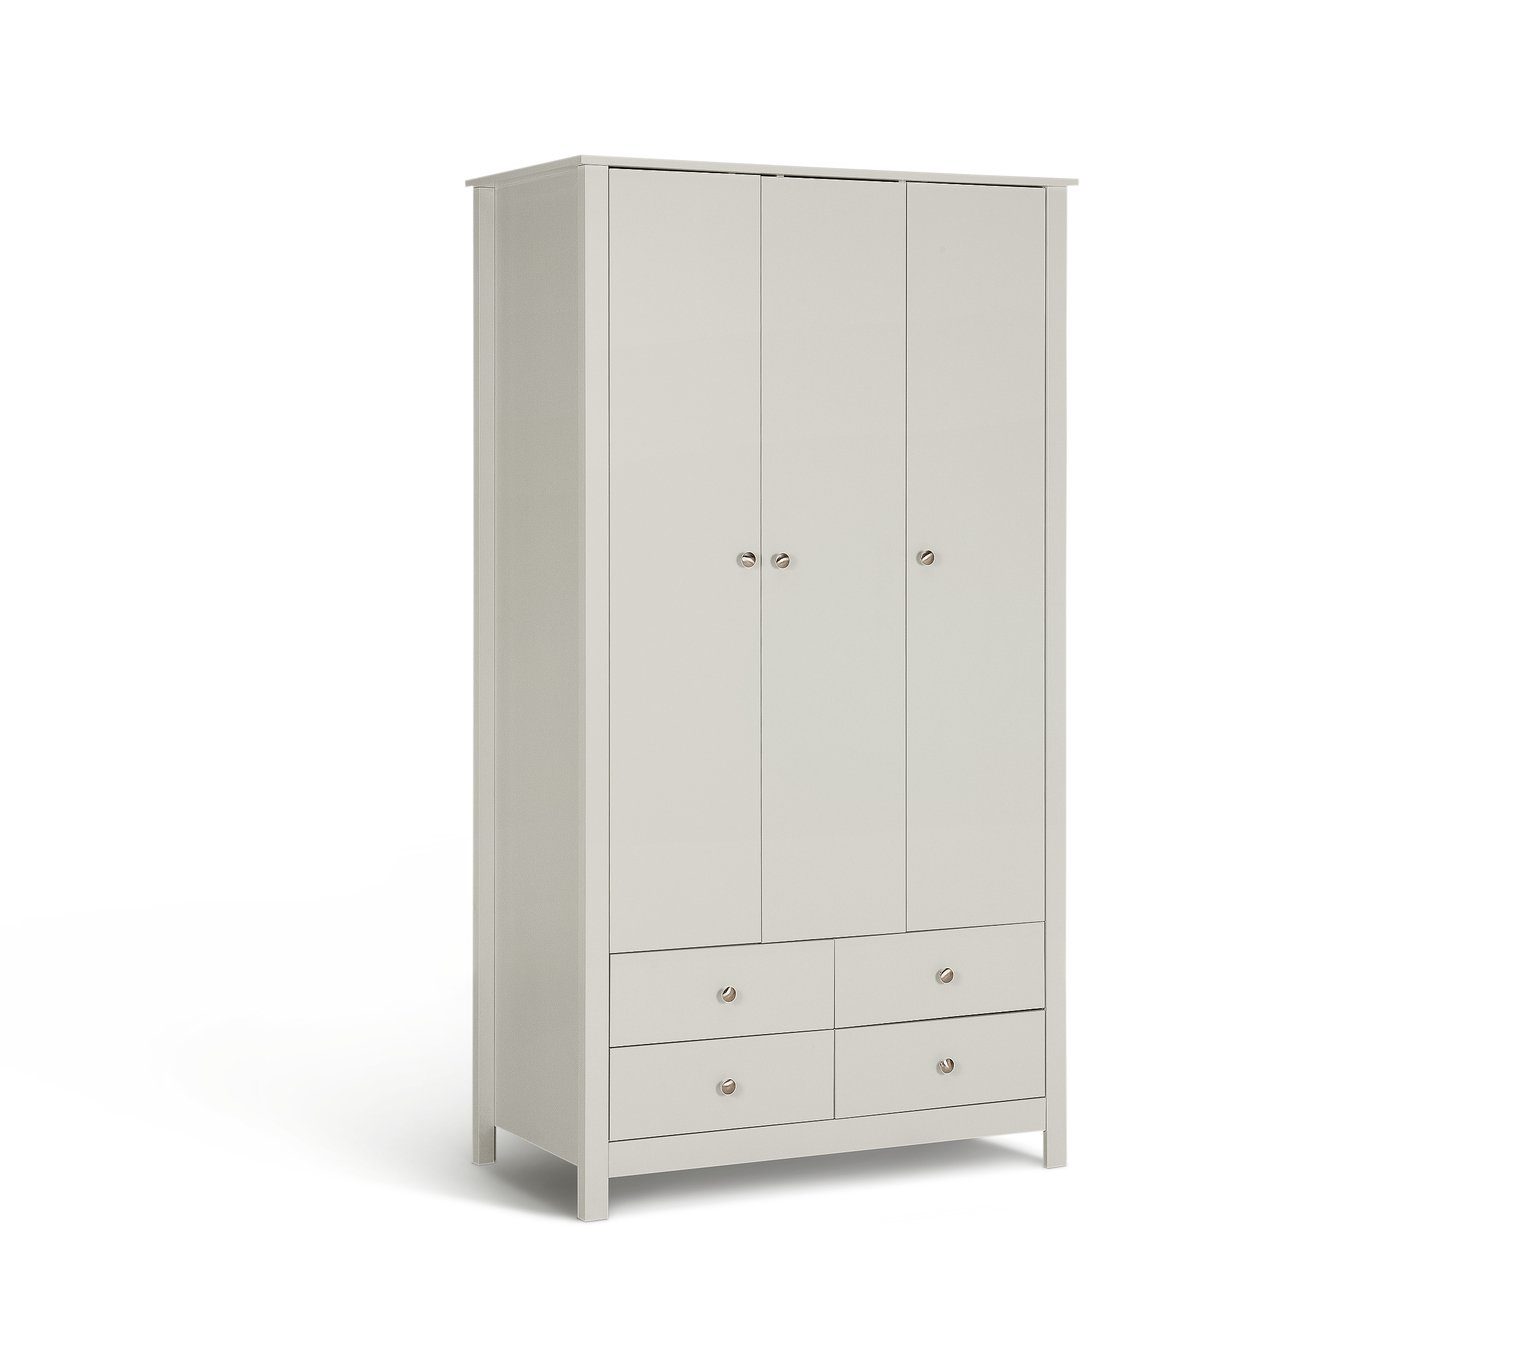 Argos Home Osaka 3 Door 4 Drawer Wardrobe - Soft Grey